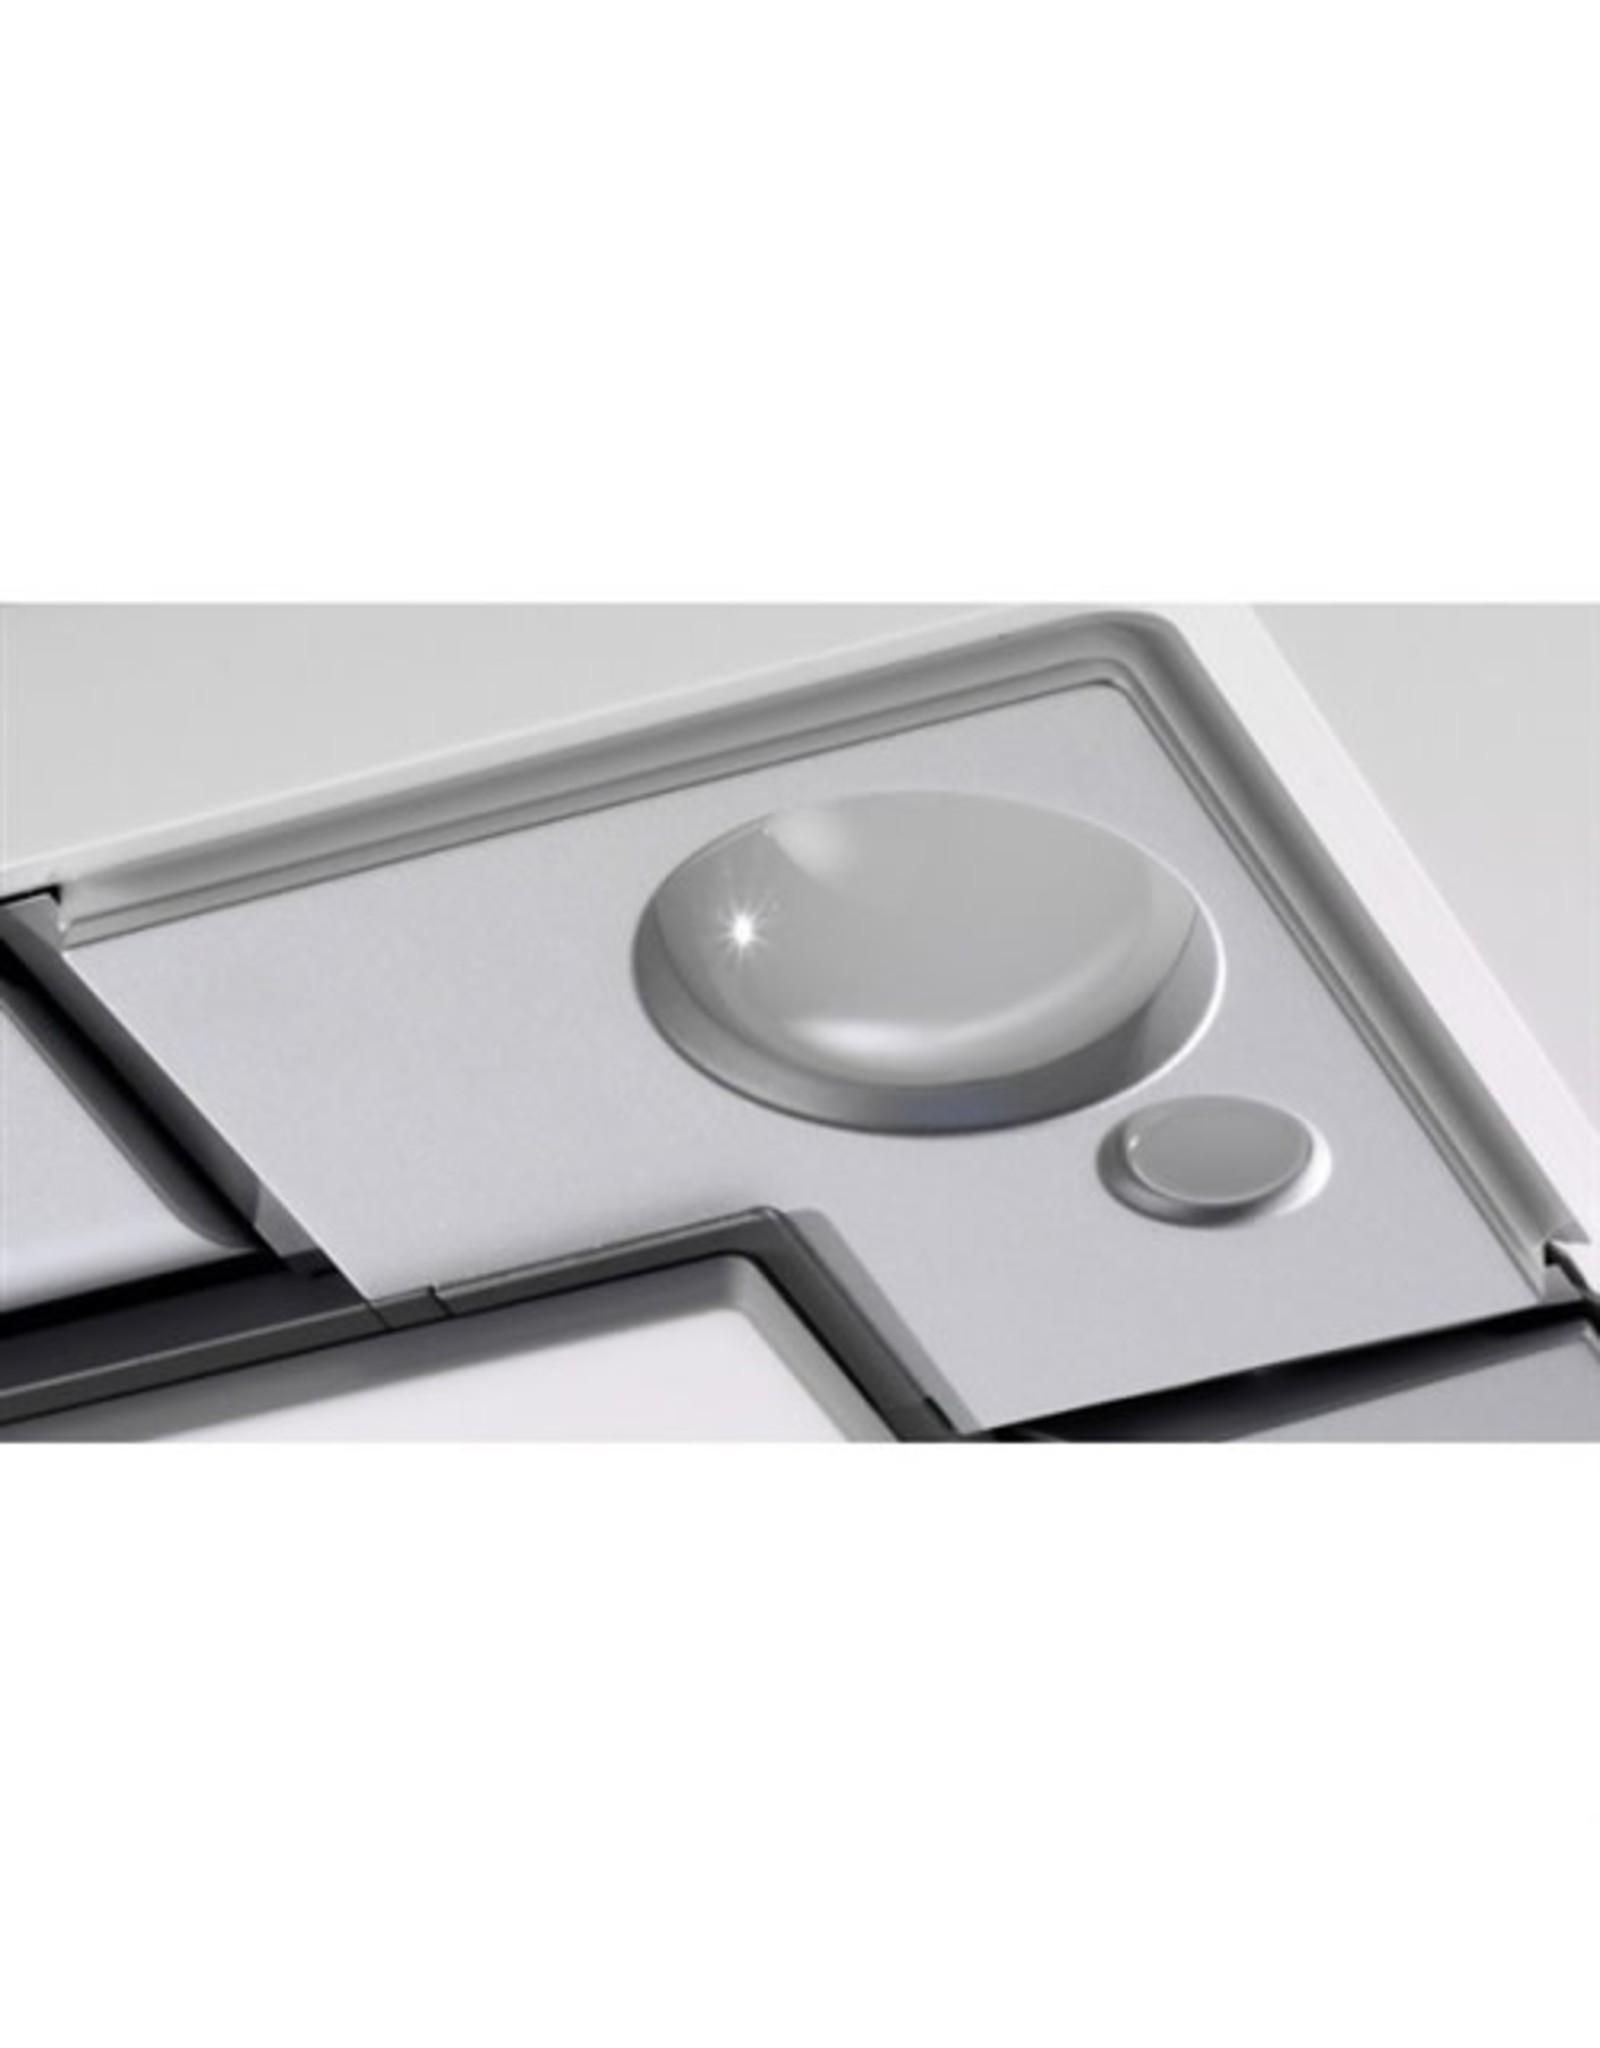 Daikin Applied Americas Sensor kit  Intelligent Eye, Comfort Airflow, and Floor Sensor